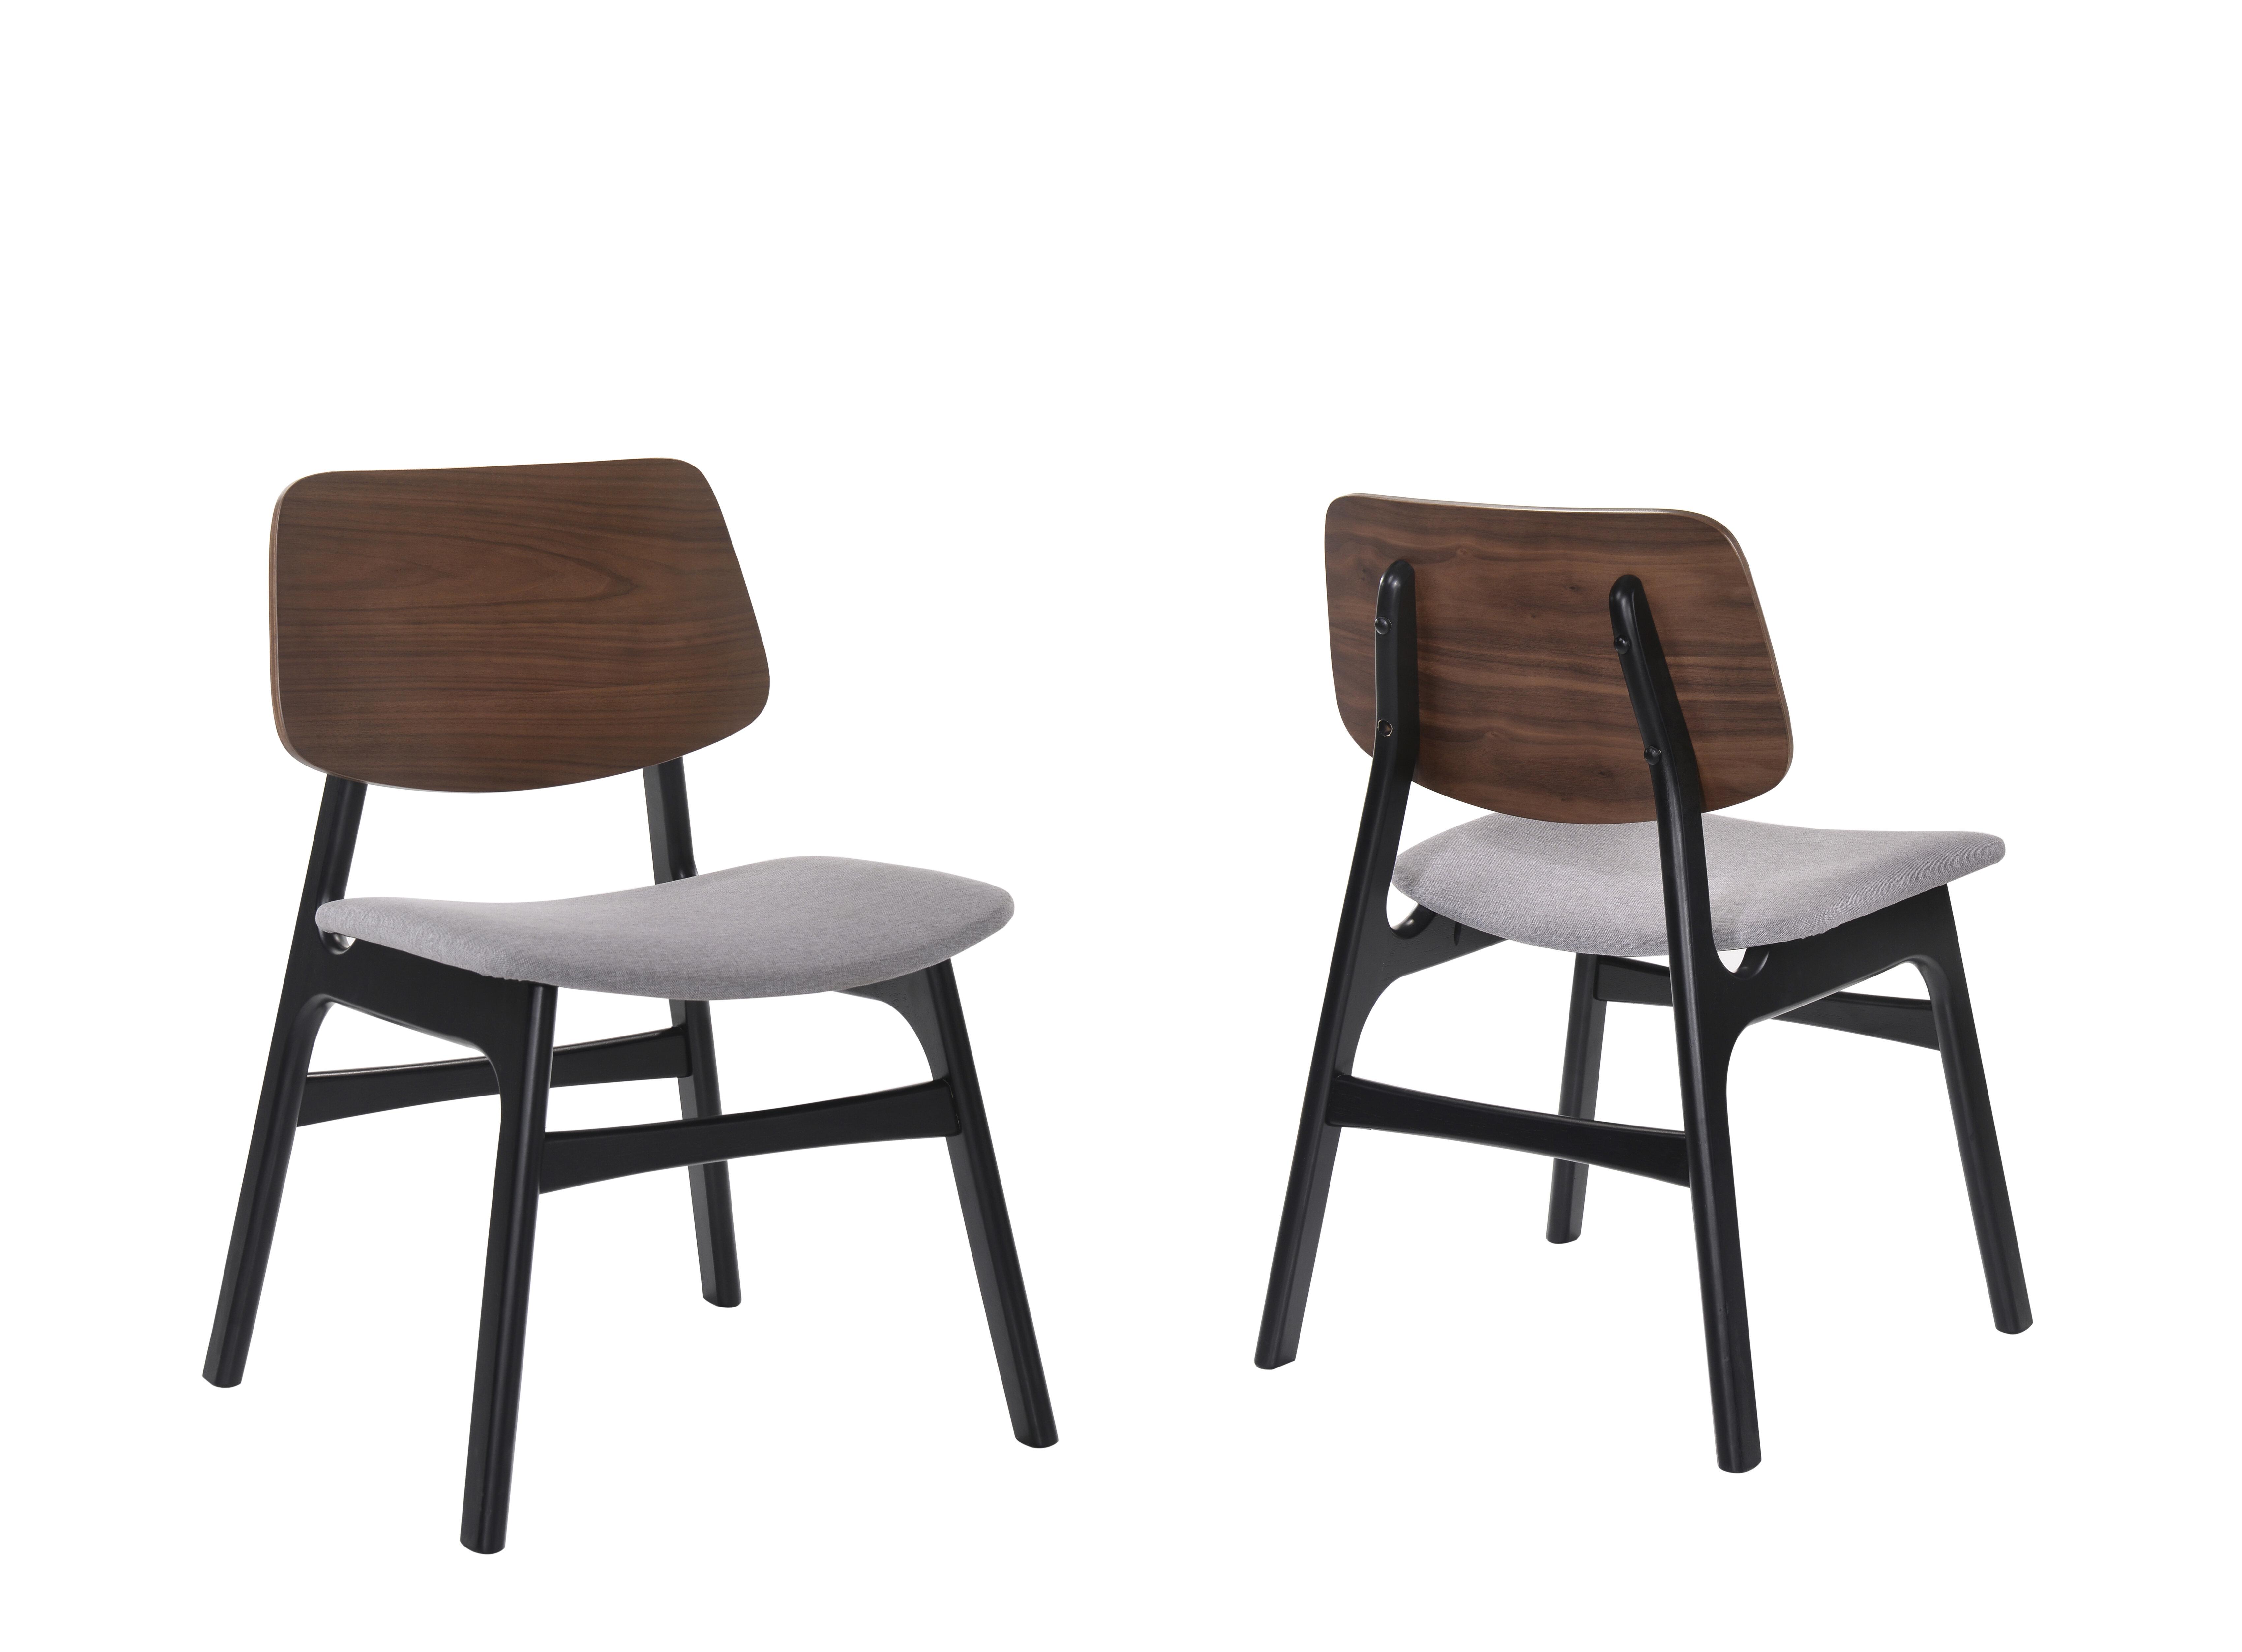 Terrific Paityn Modern Curved Back Upholstered Dining Chair Uwap Interior Chair Design Uwaporg